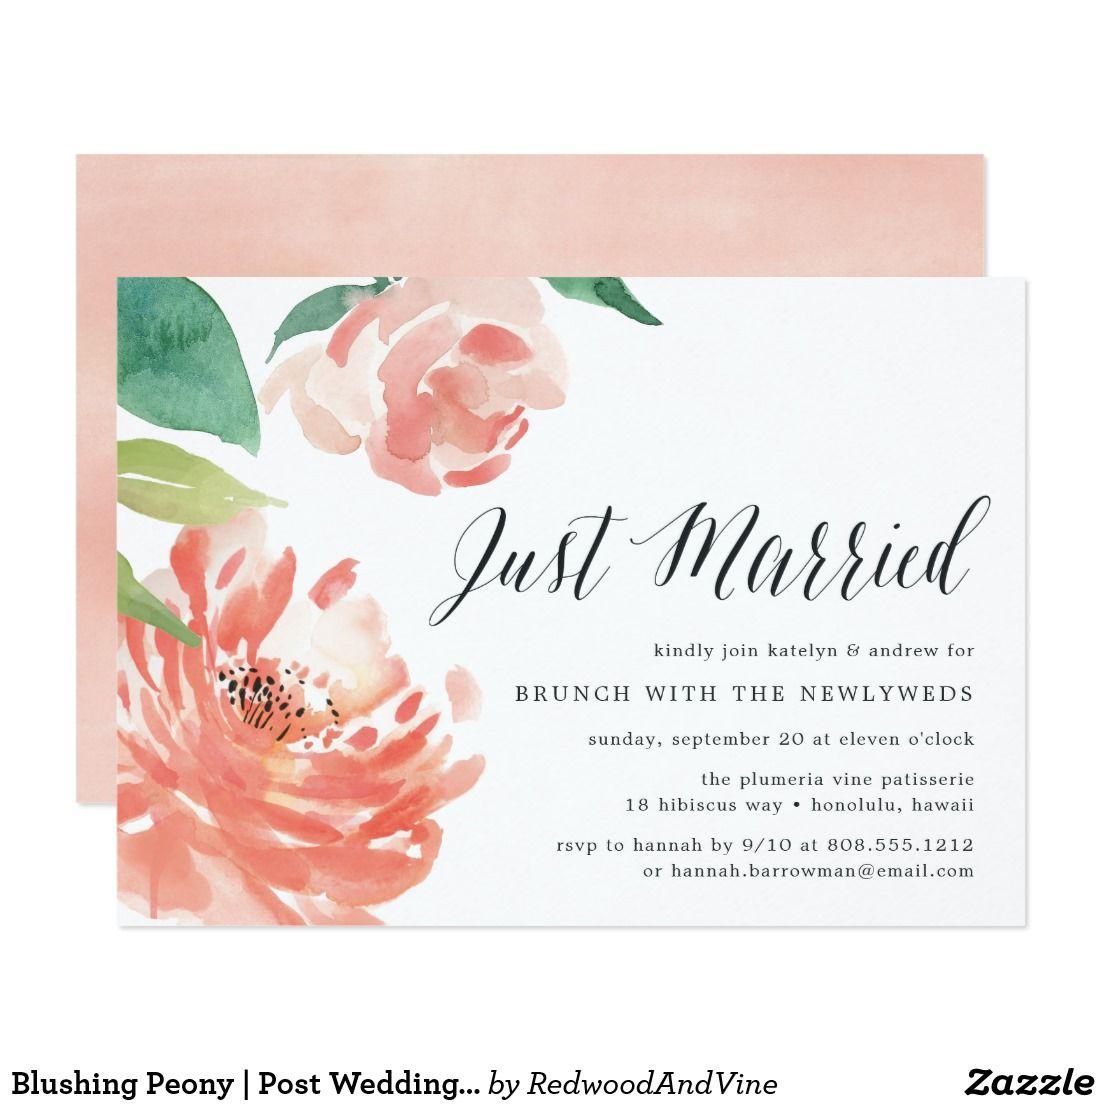 Blushing Peony   Post Wedding Brunch Invitation   Pinterest   Brunch ...